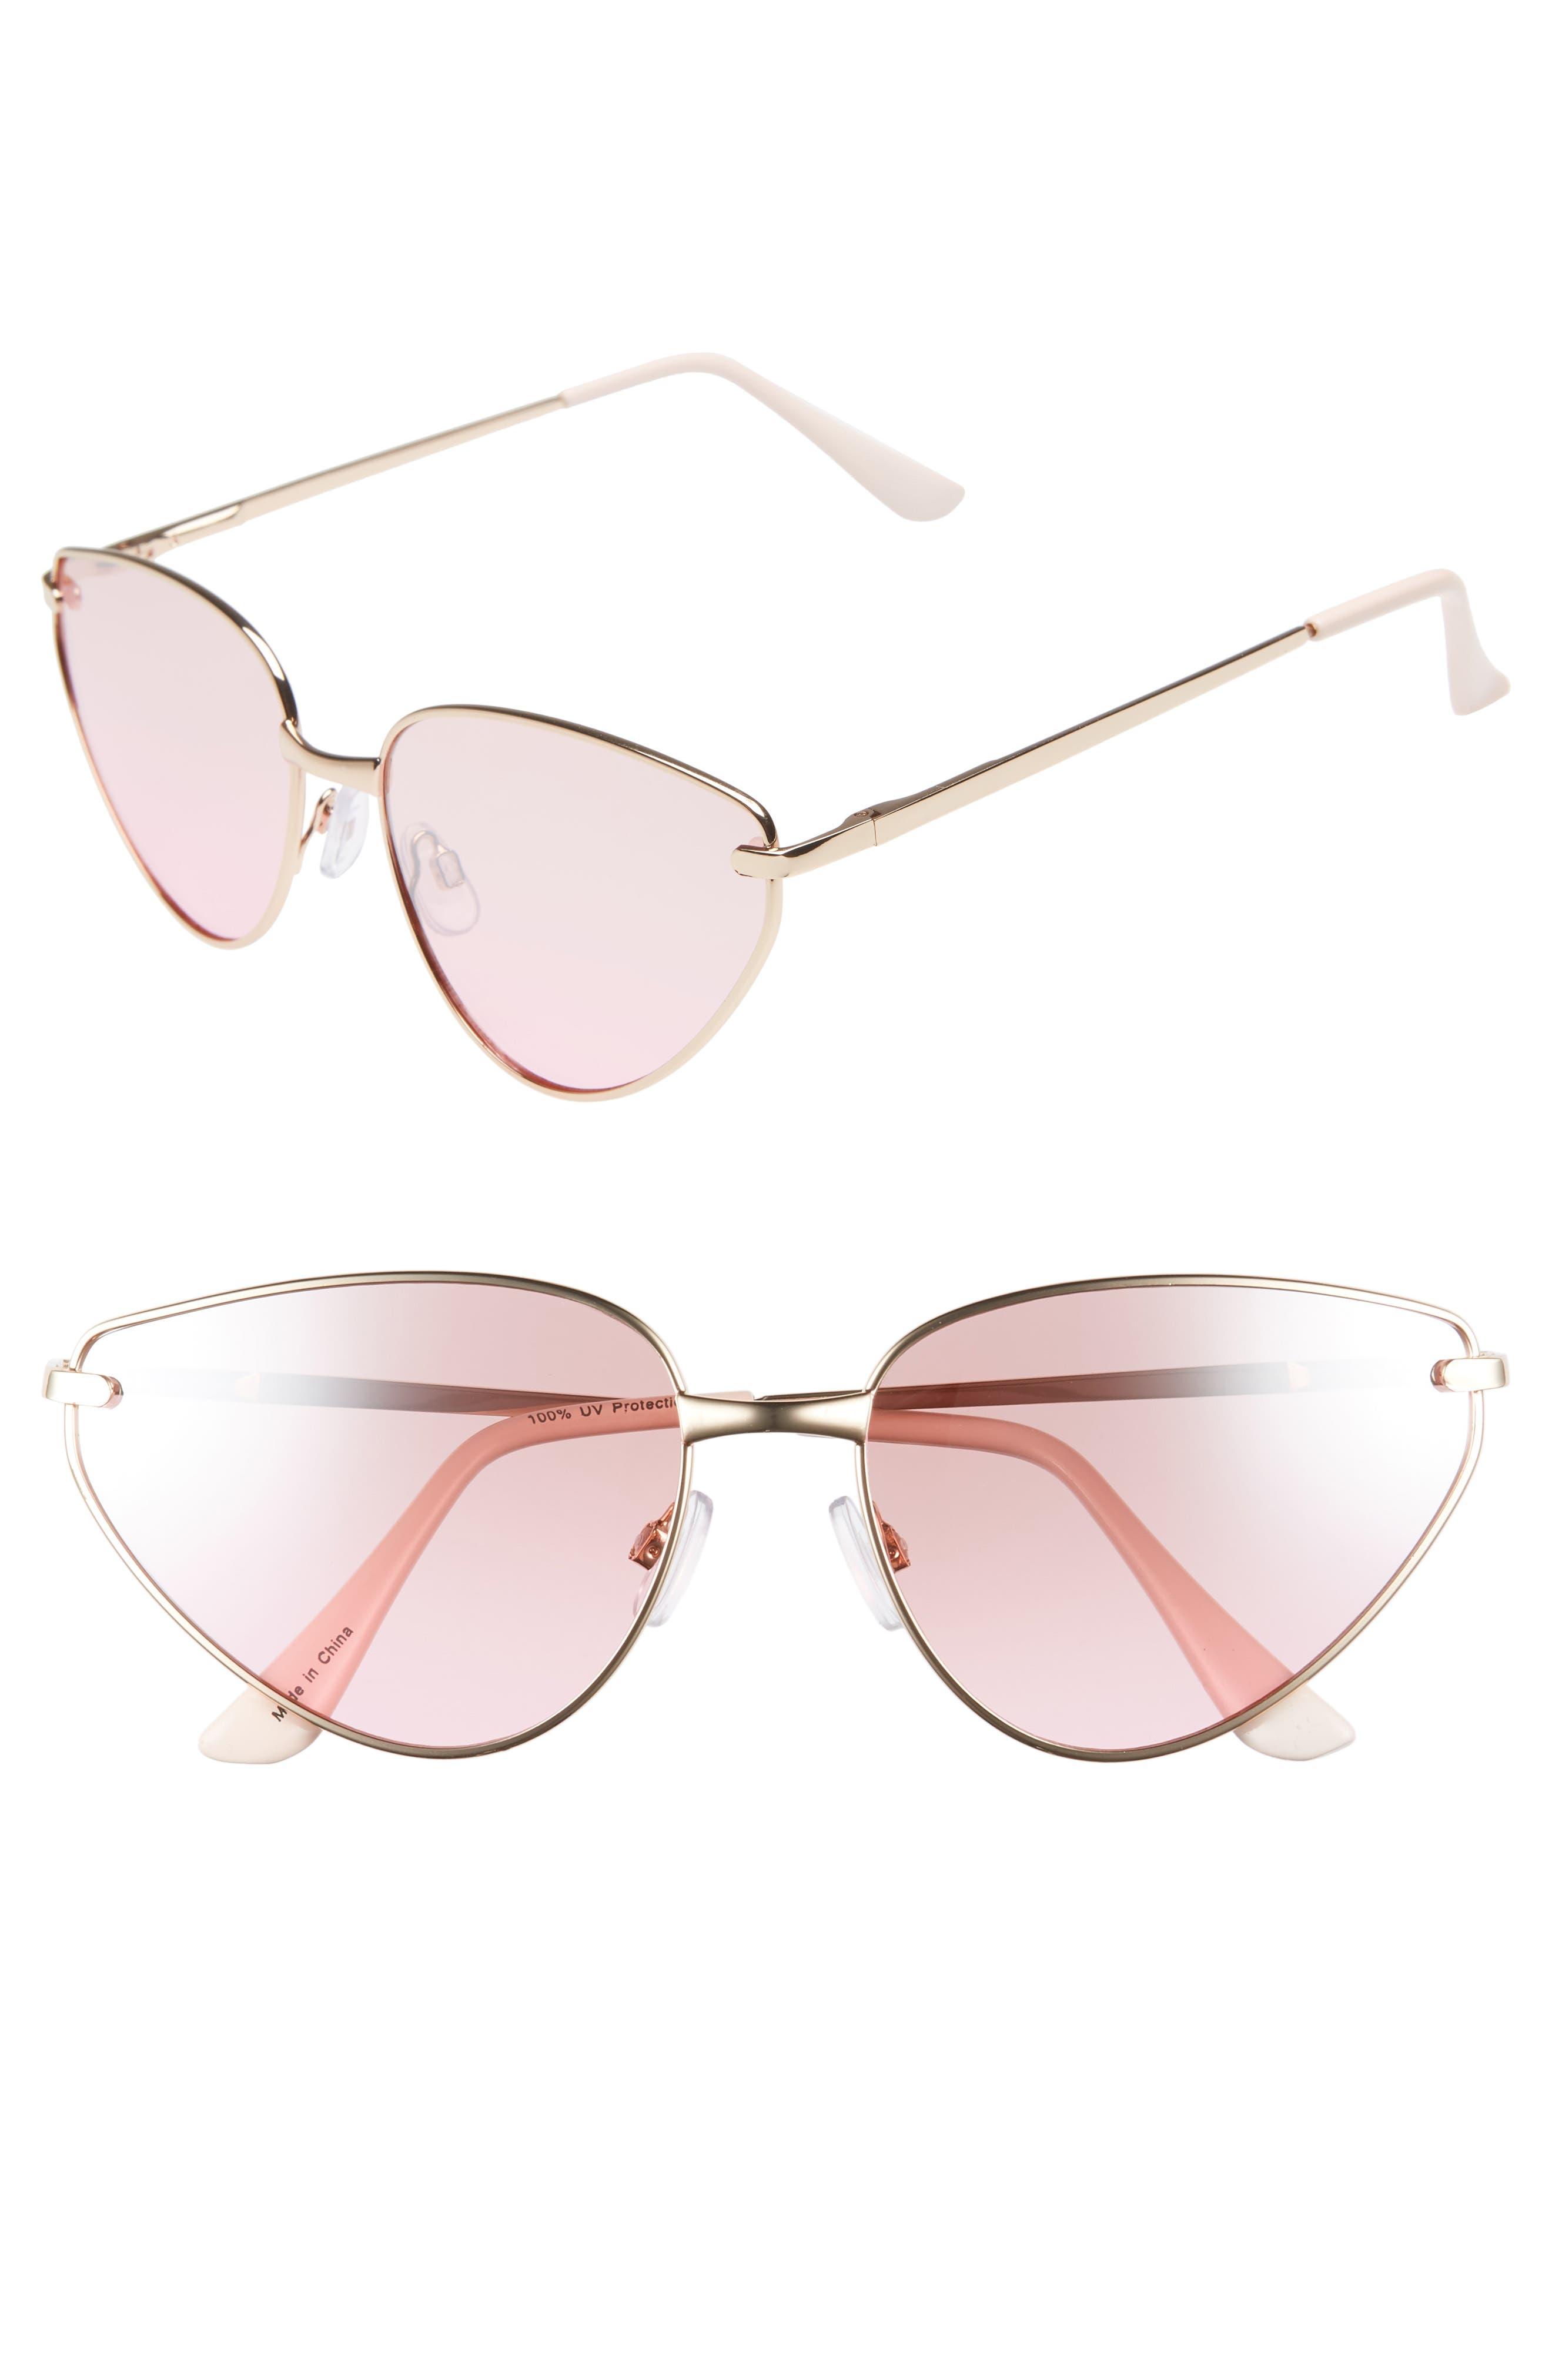 60mm Exaggerated Cat Eye Sunglasses,                             Main thumbnail 1, color,                             710